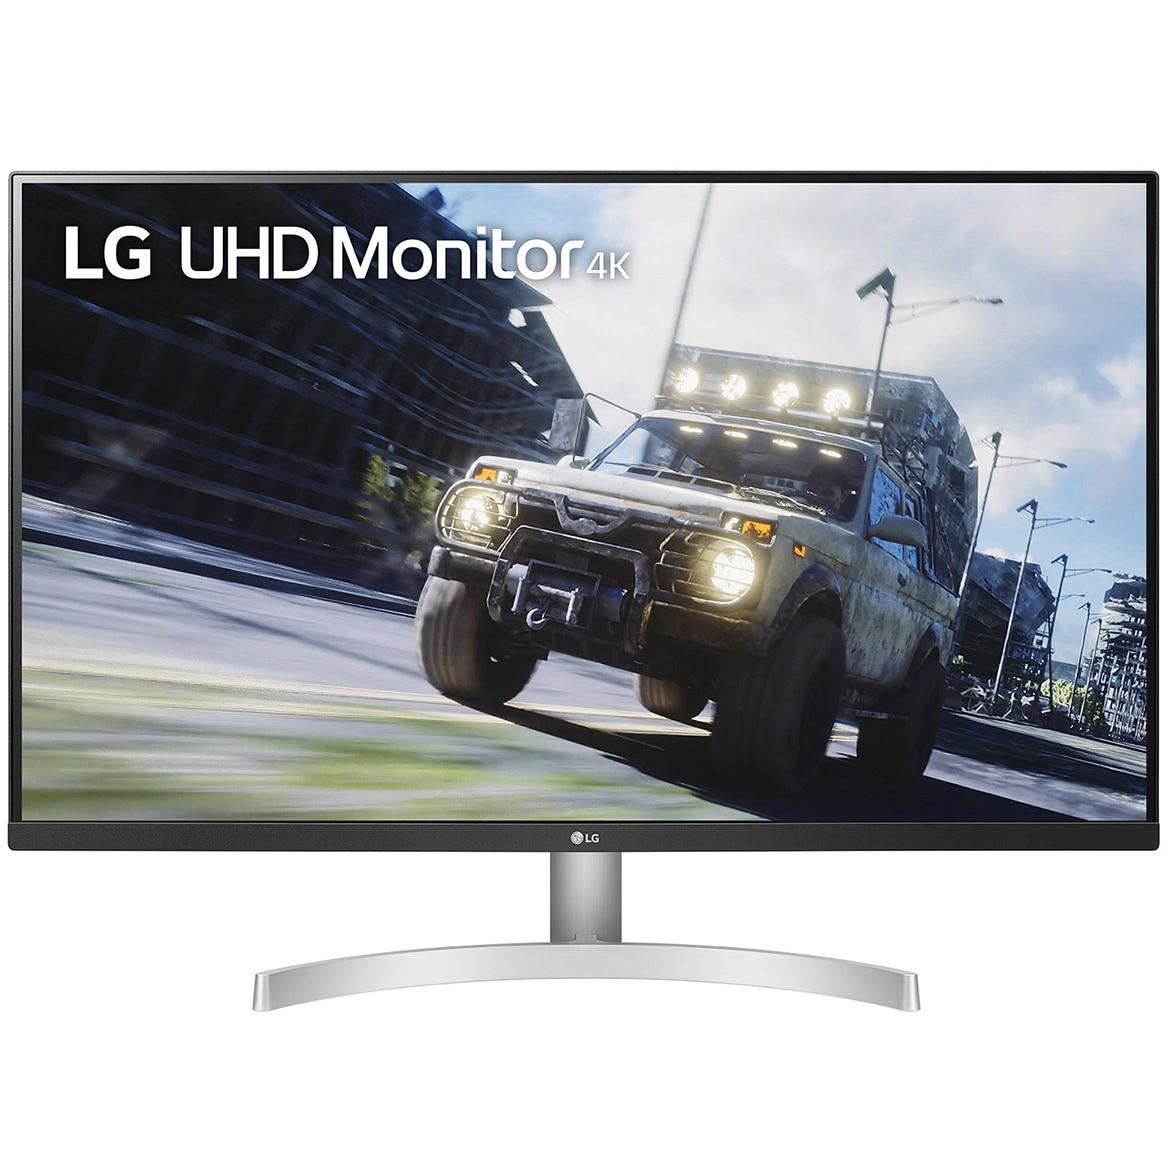 "Fotografie Monitor LED VA LG 31.5"", 4K UHD, HDR10, FreeSync, HDMI, DP, 32UN500-W"